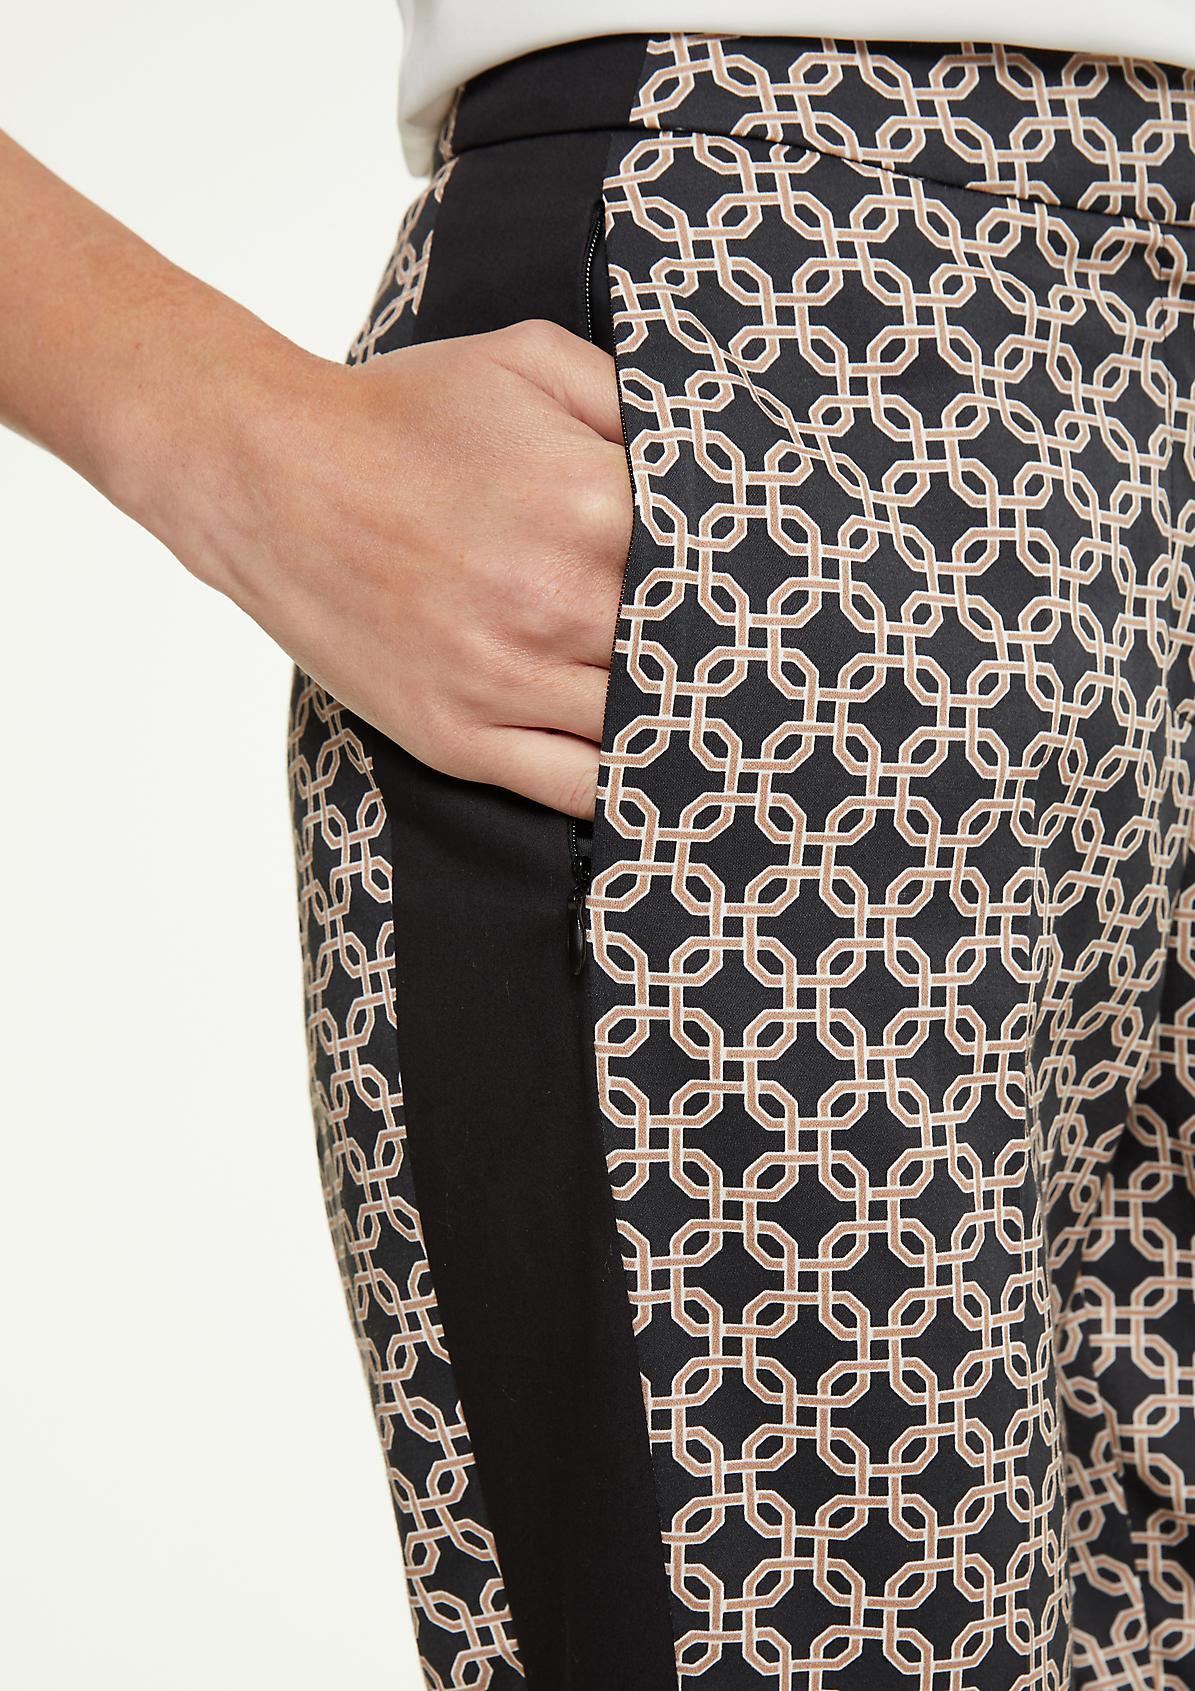 Printmuster-Hose aus Baumwollsatin